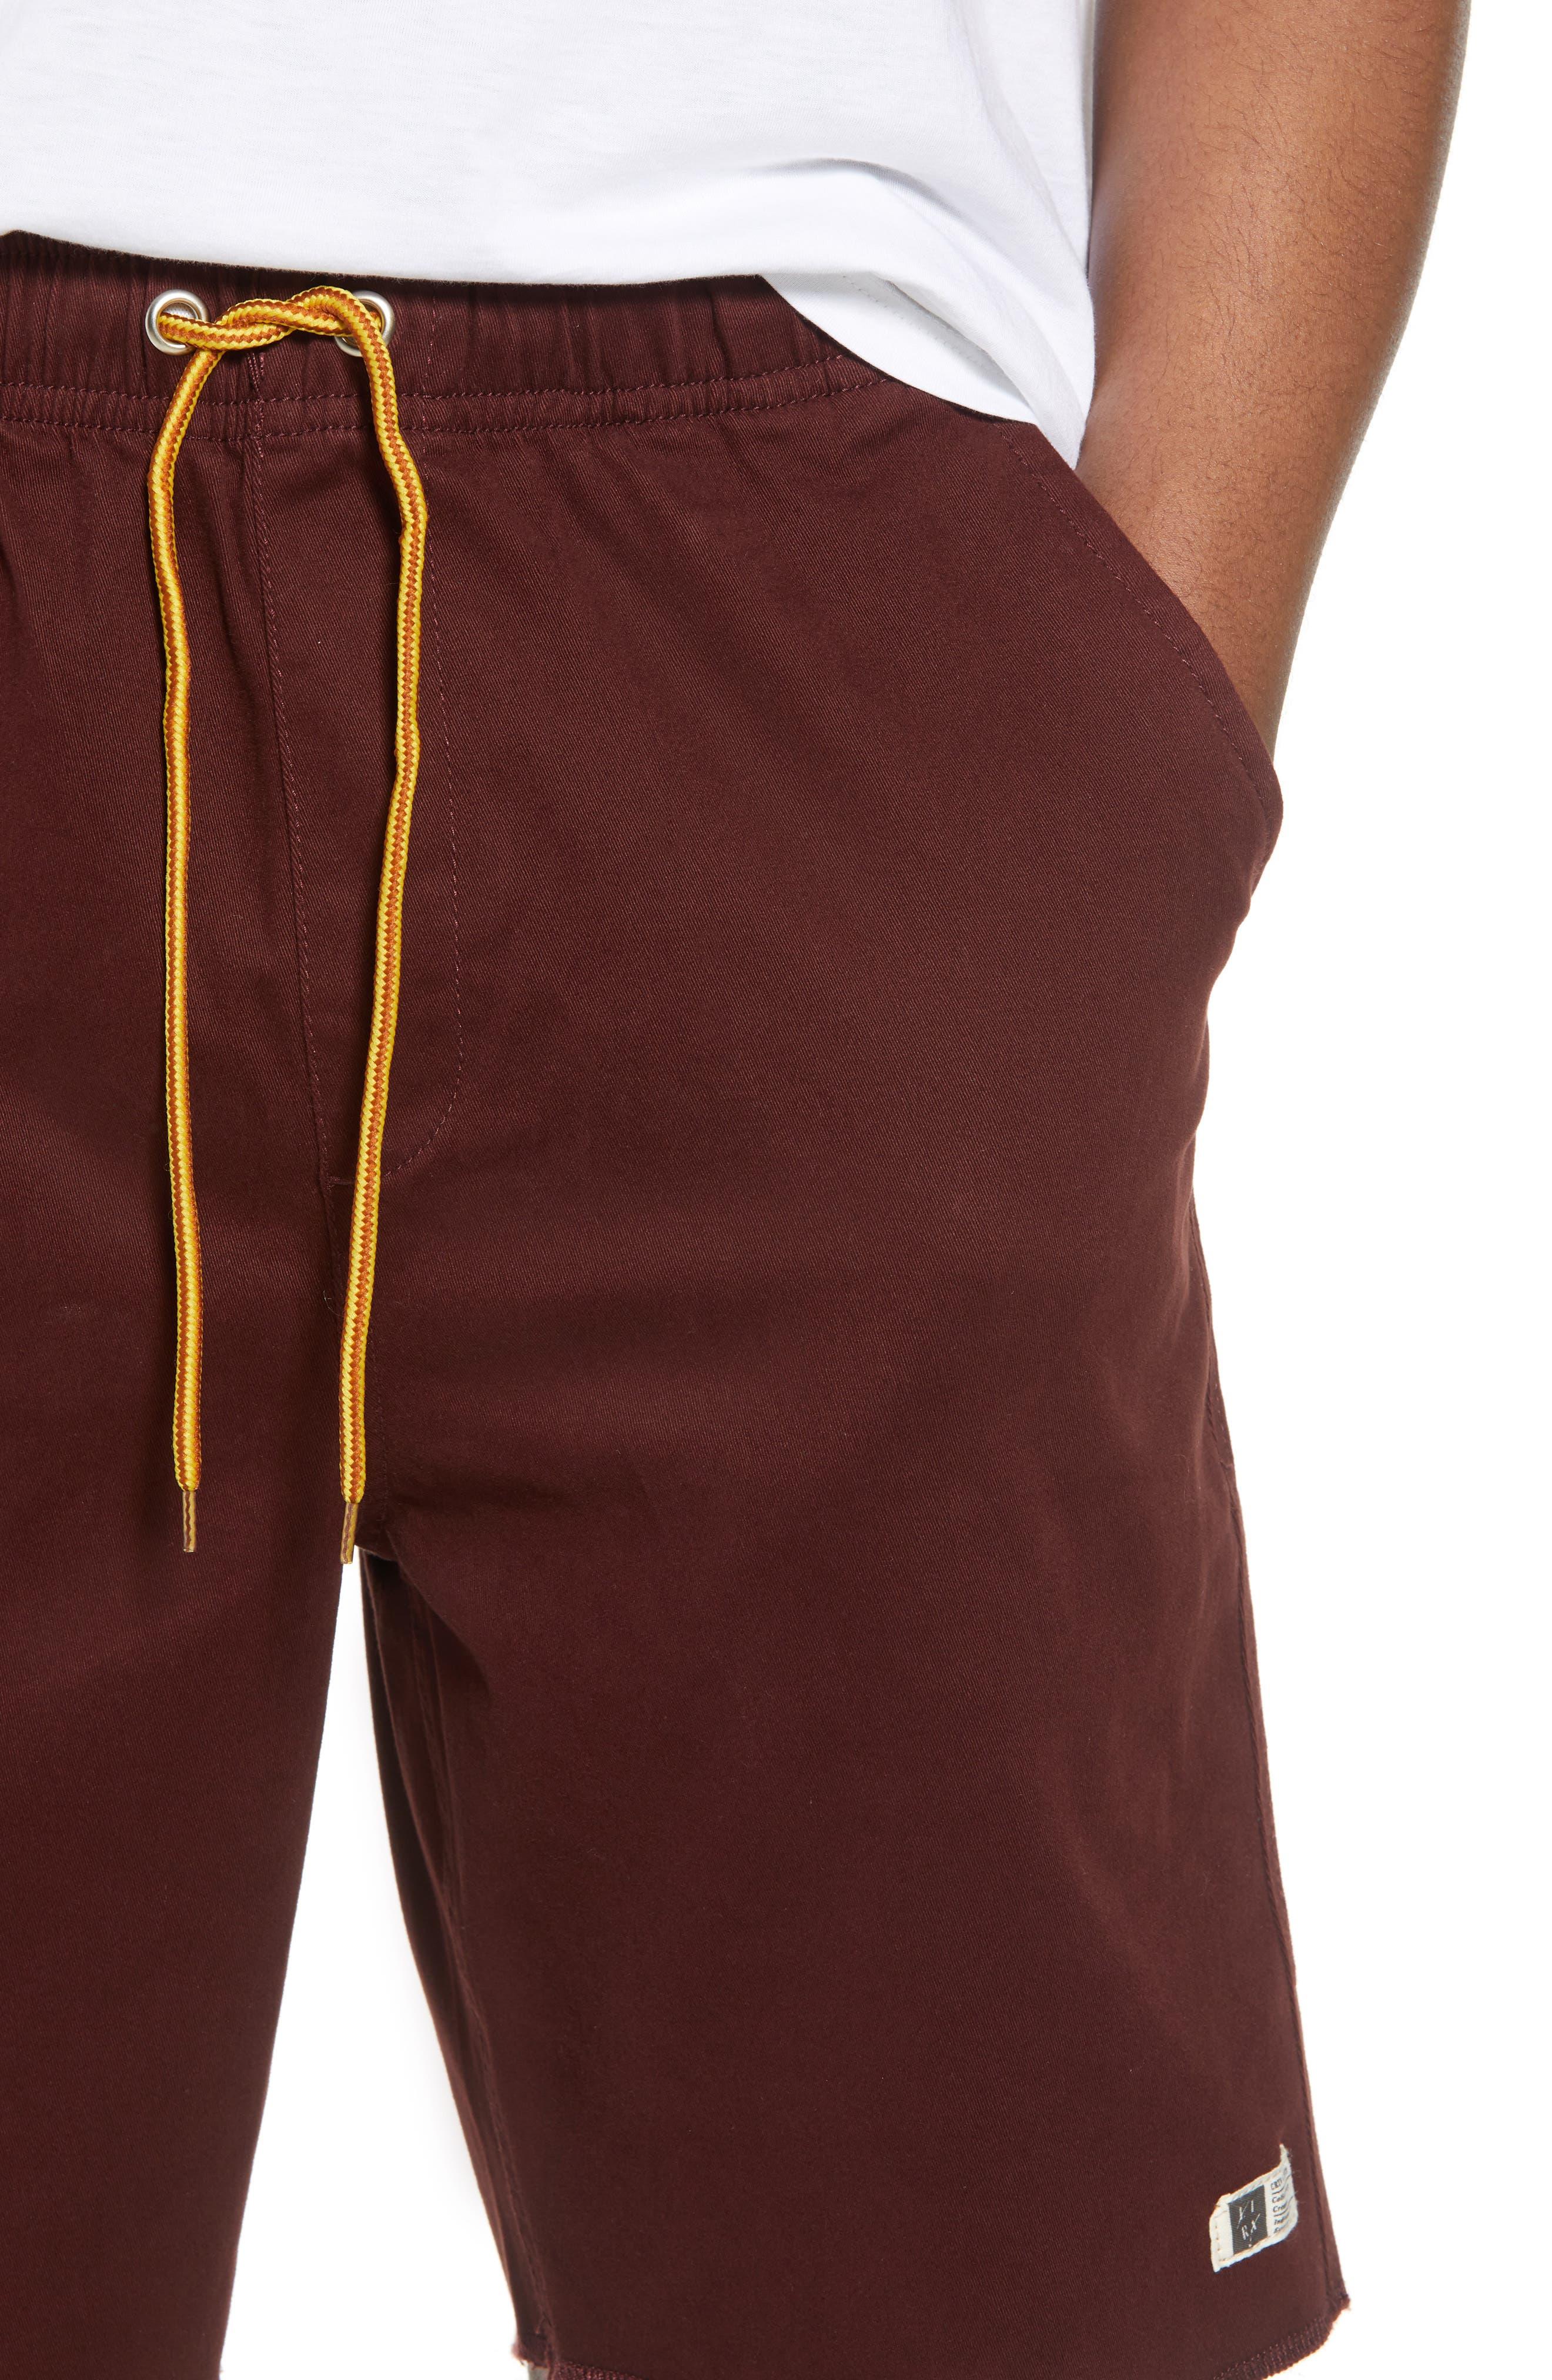 Weekday Shorts,                             Alternate thumbnail 4, color,                             BURGUNDY